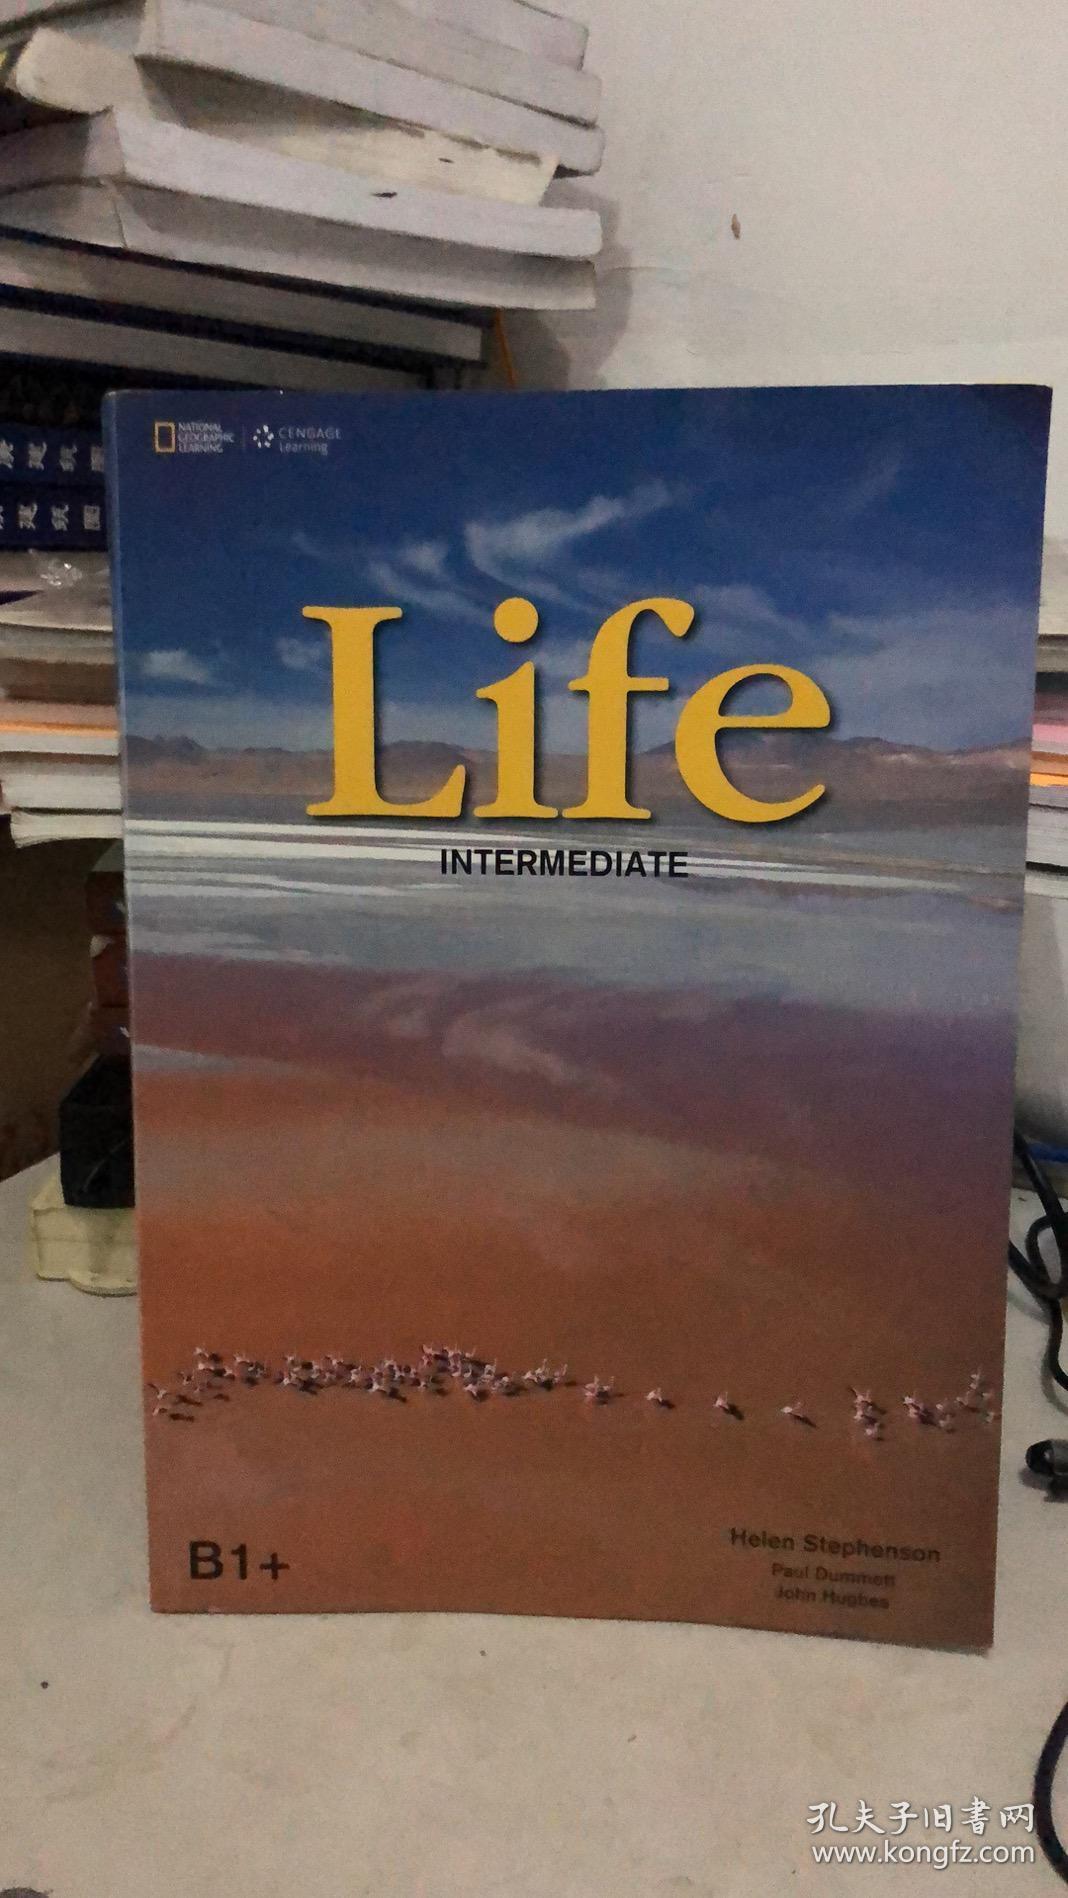 LIFE  intermediate  9781133315711